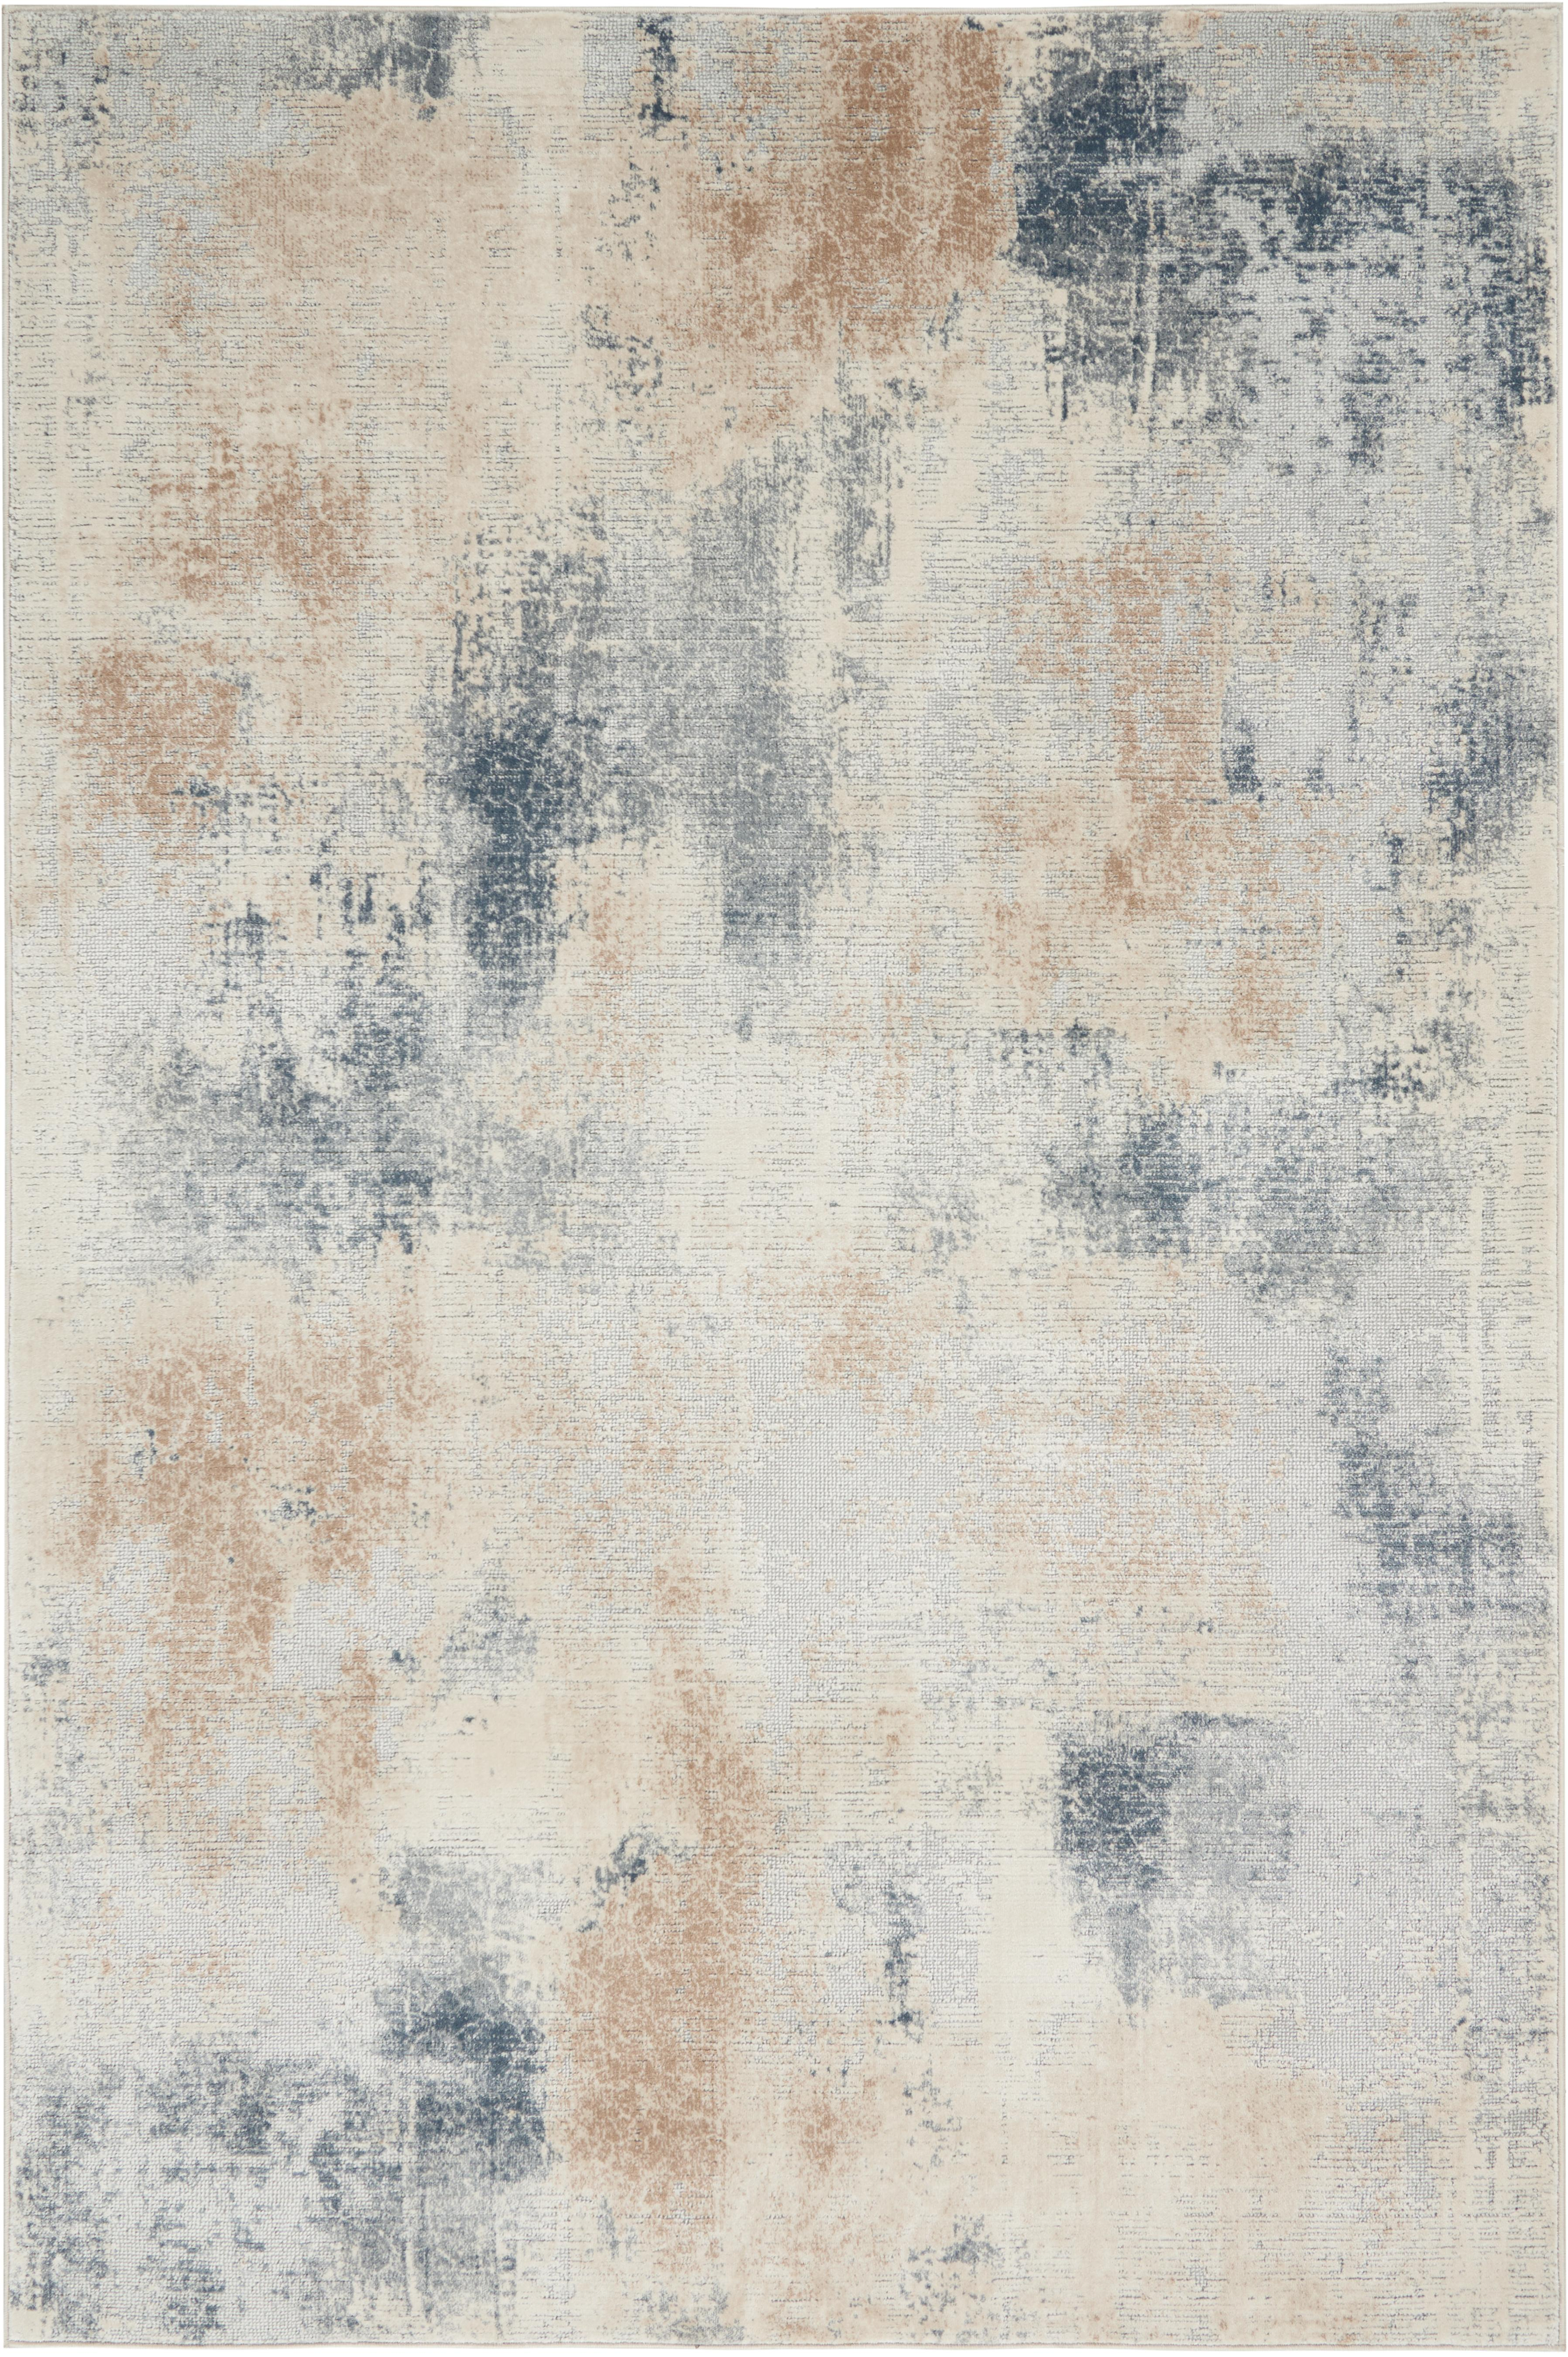 Tappeto di design beige/grigio Rustic Textures, Retro: 50%juta, 50%Latex, Tonalità beige, grigio, Larg. 120 x Lung. 180 cm (taglia S)